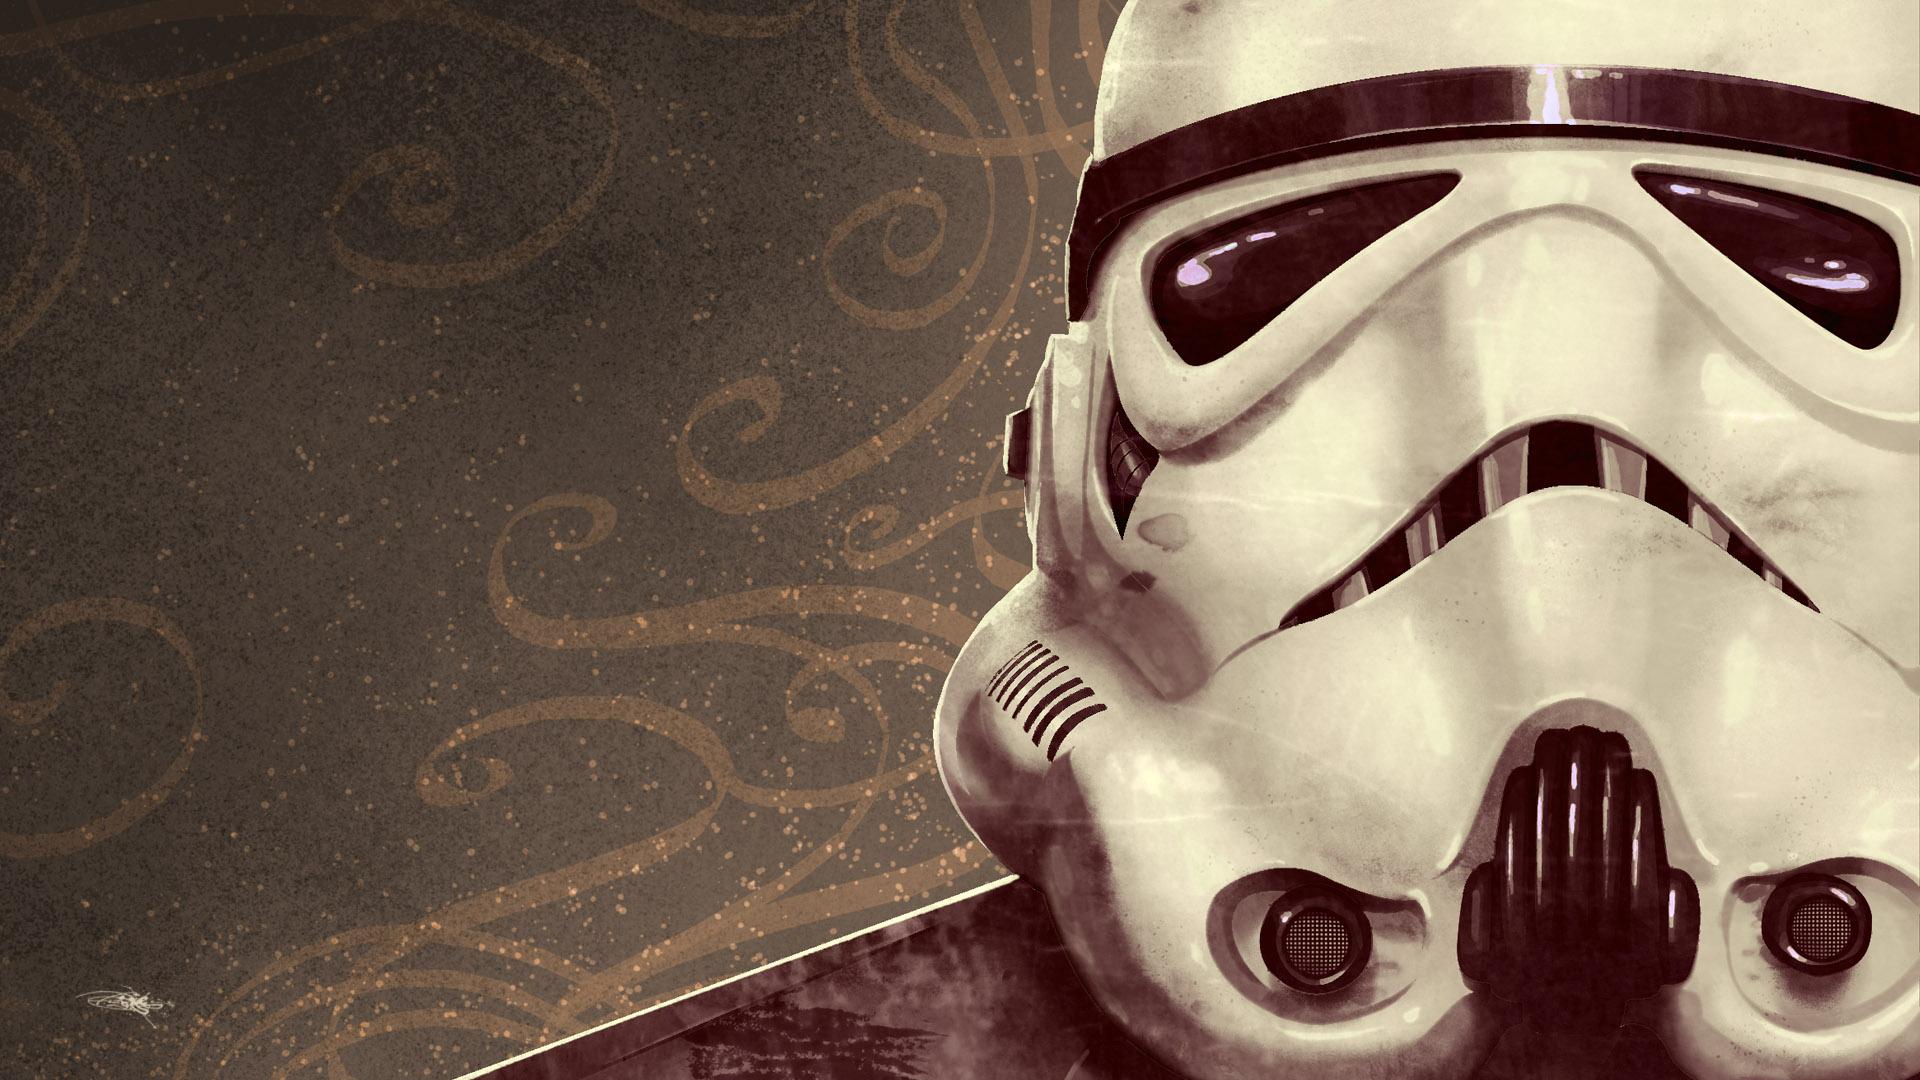 1920 x 1080 Wallpapers Full HD Wallpapers 1080p 16945 star wars 1920x1080